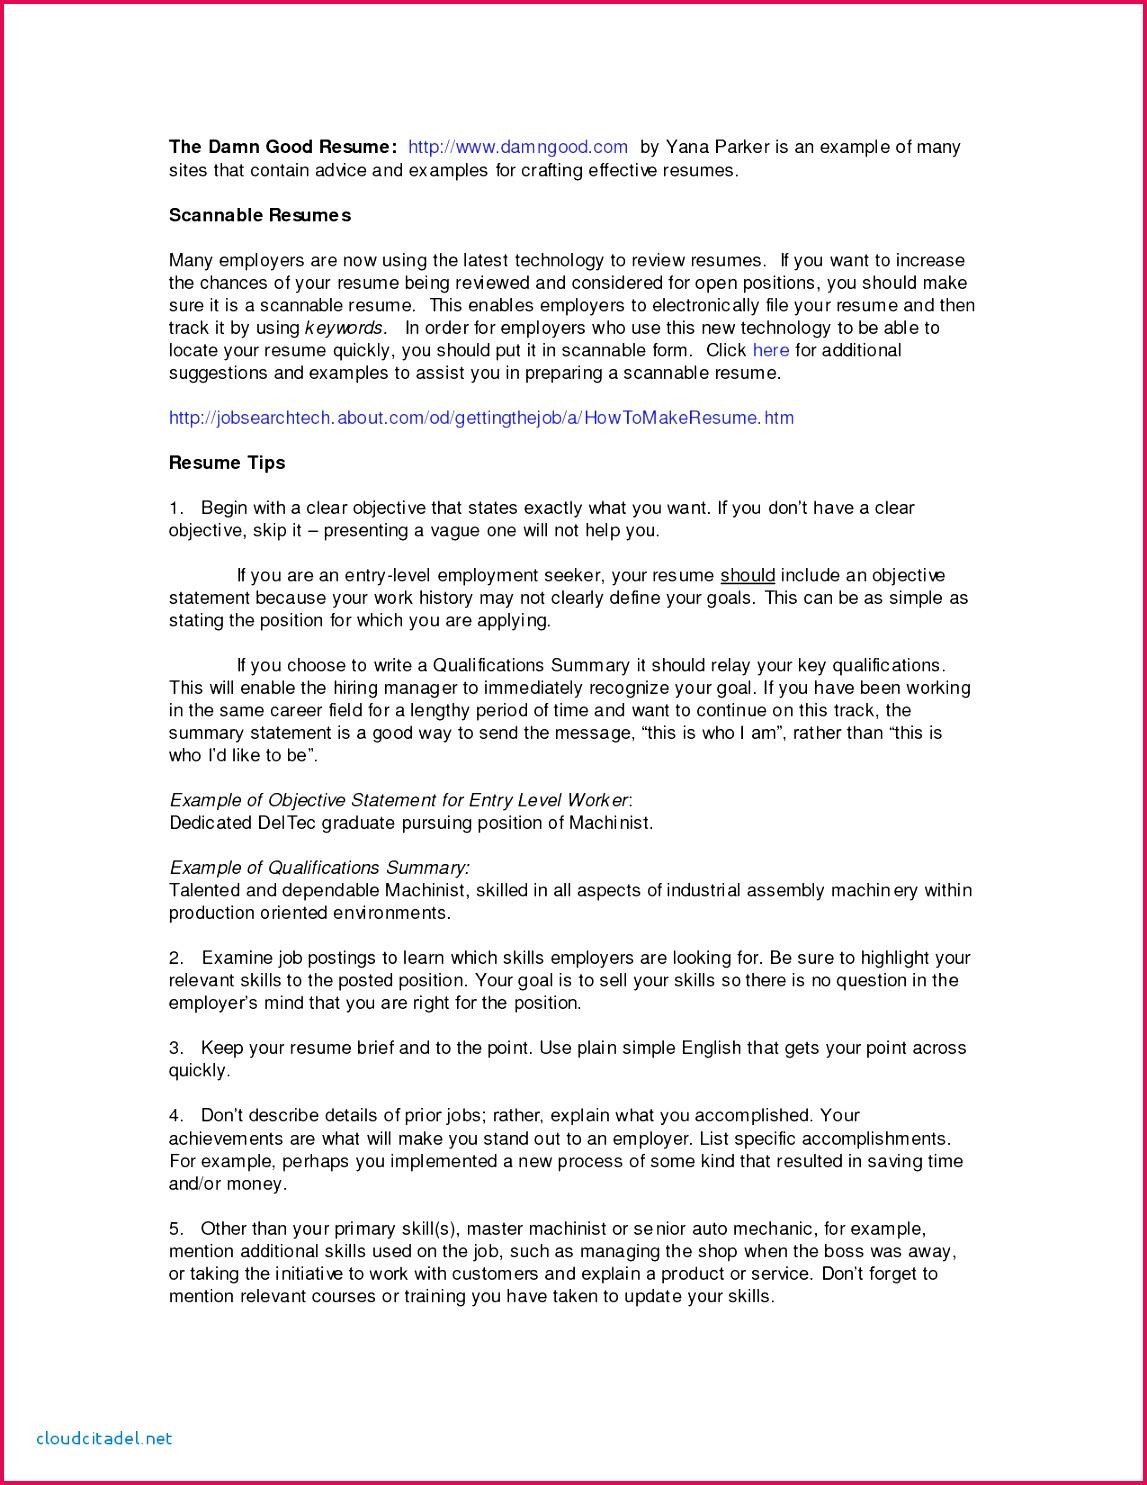 Graduate School Application Letter Samples Fresh Law School Application Resume Inspirational 11 Lovely Sample Resume